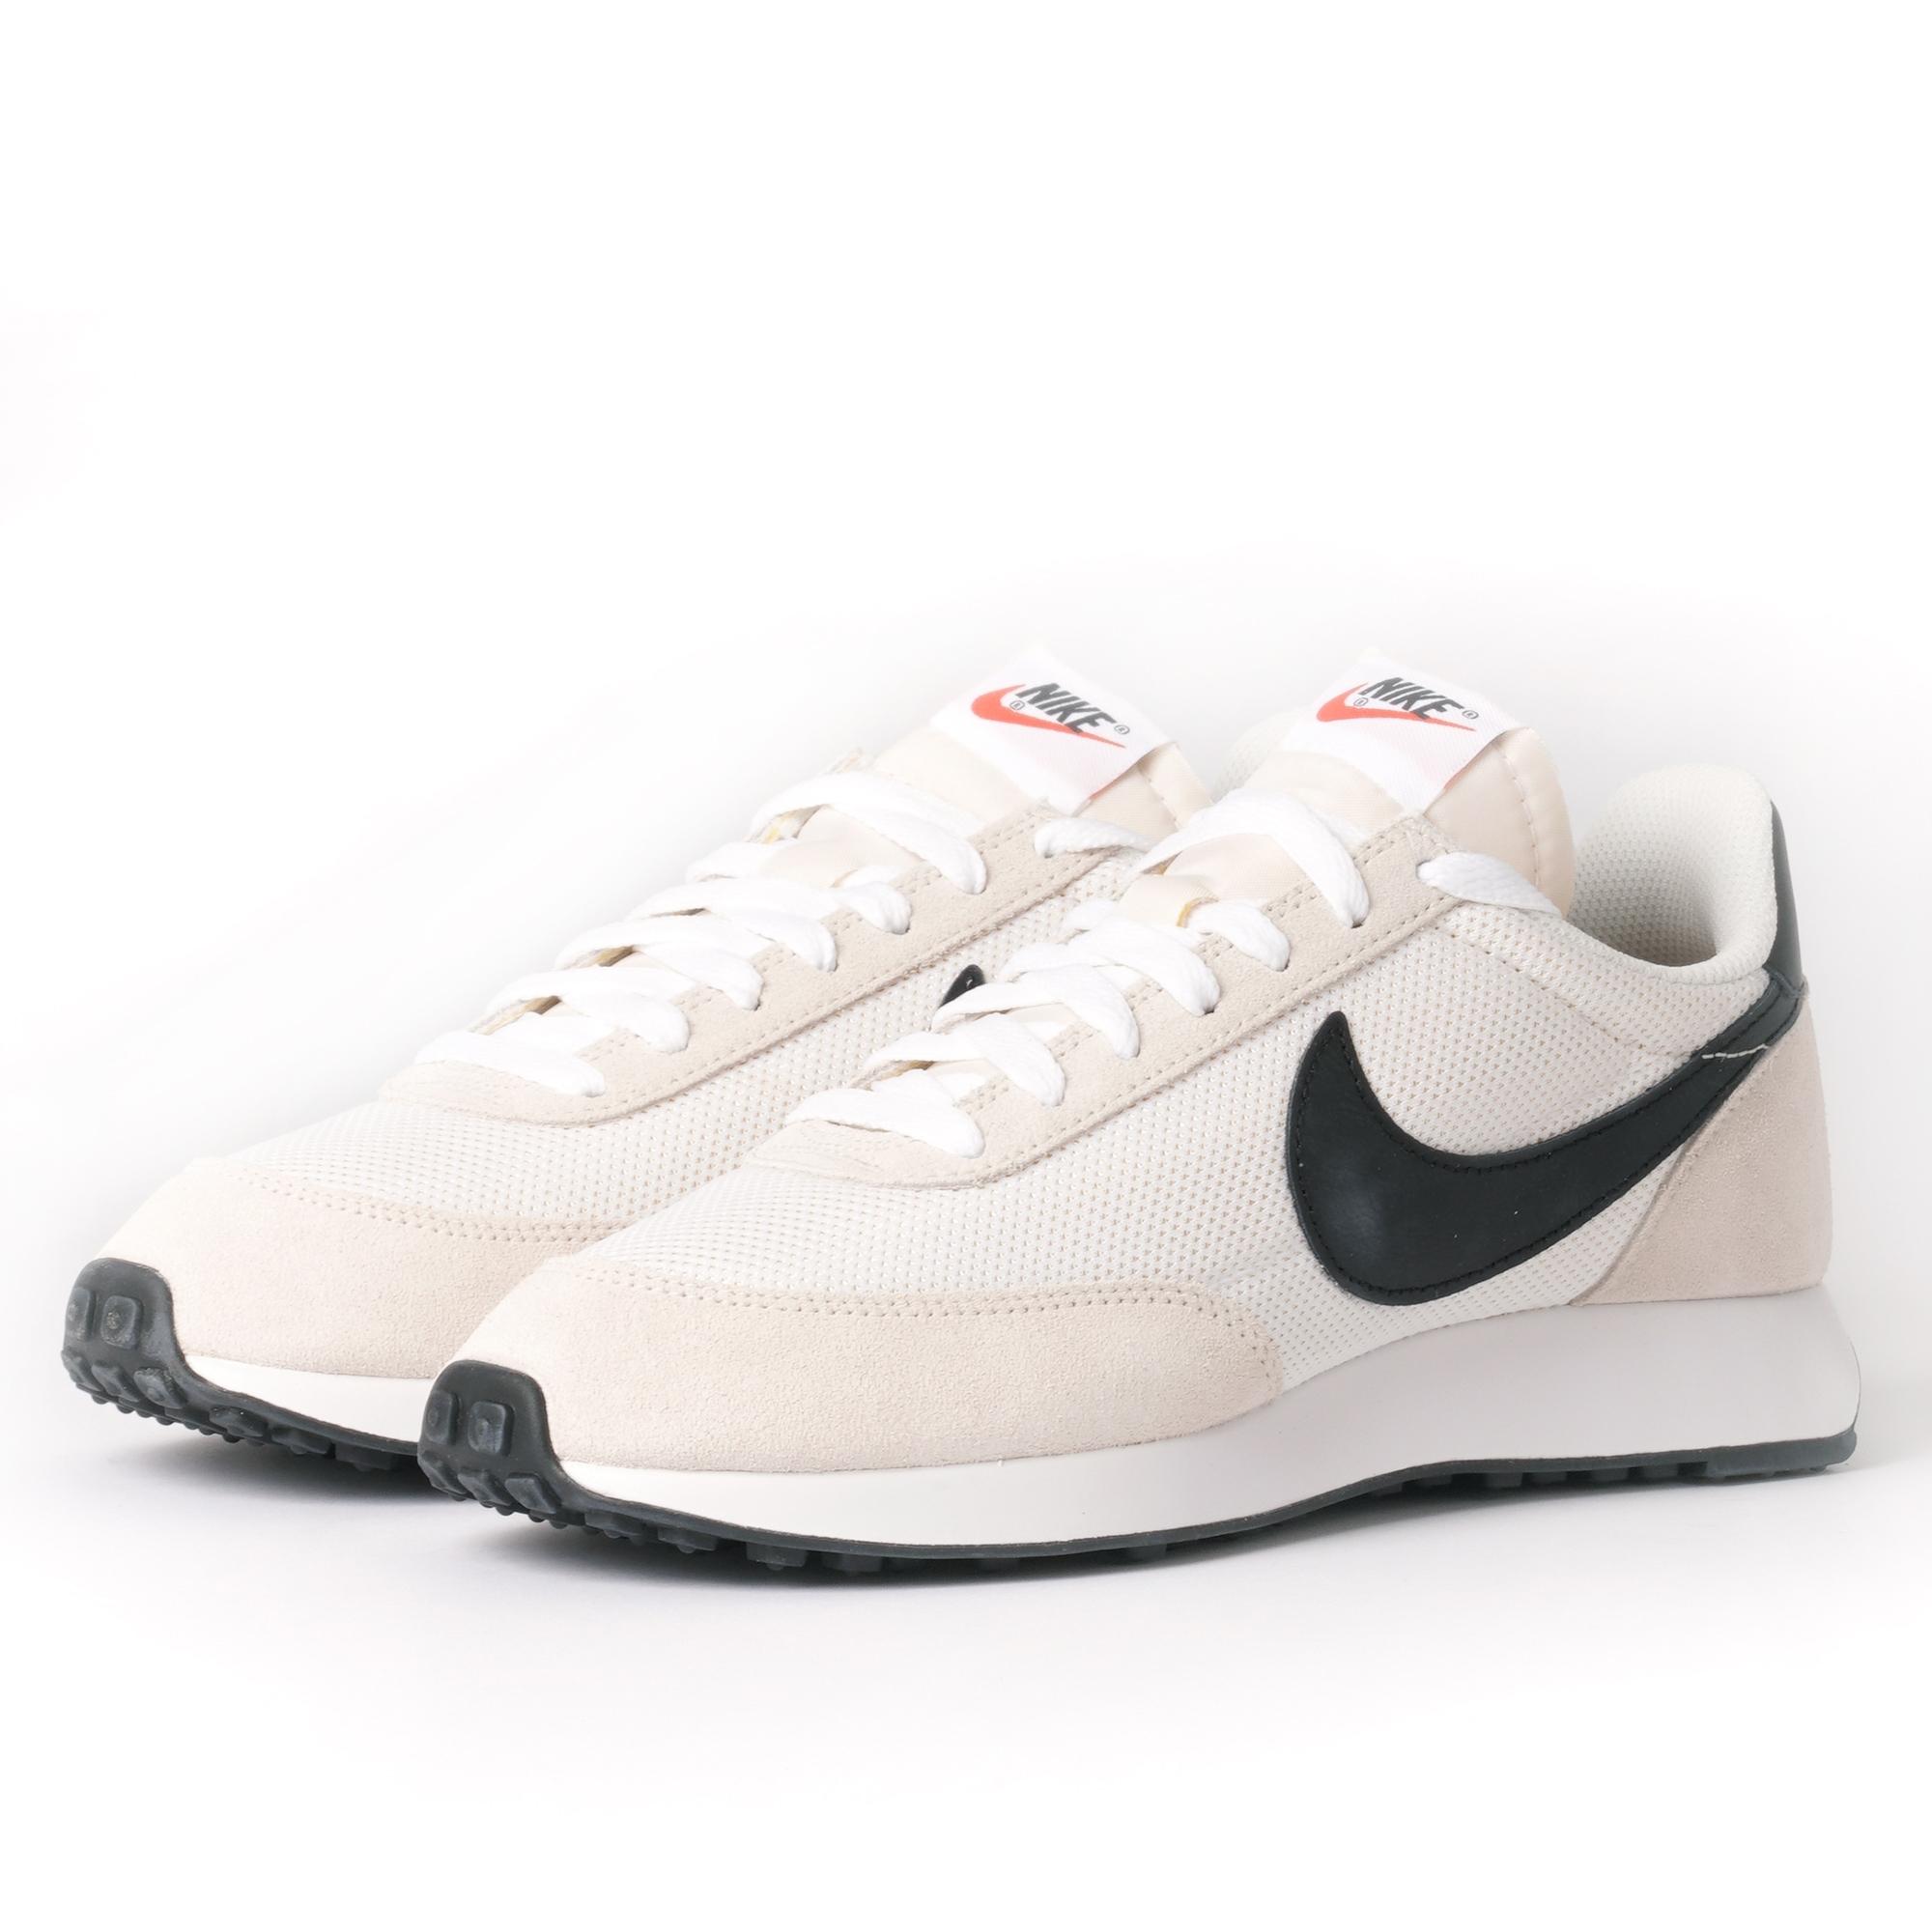 7d4cba6c Nike Air Tailwind 79 | White, Black, Phantom & Dark Grey | US Stockists